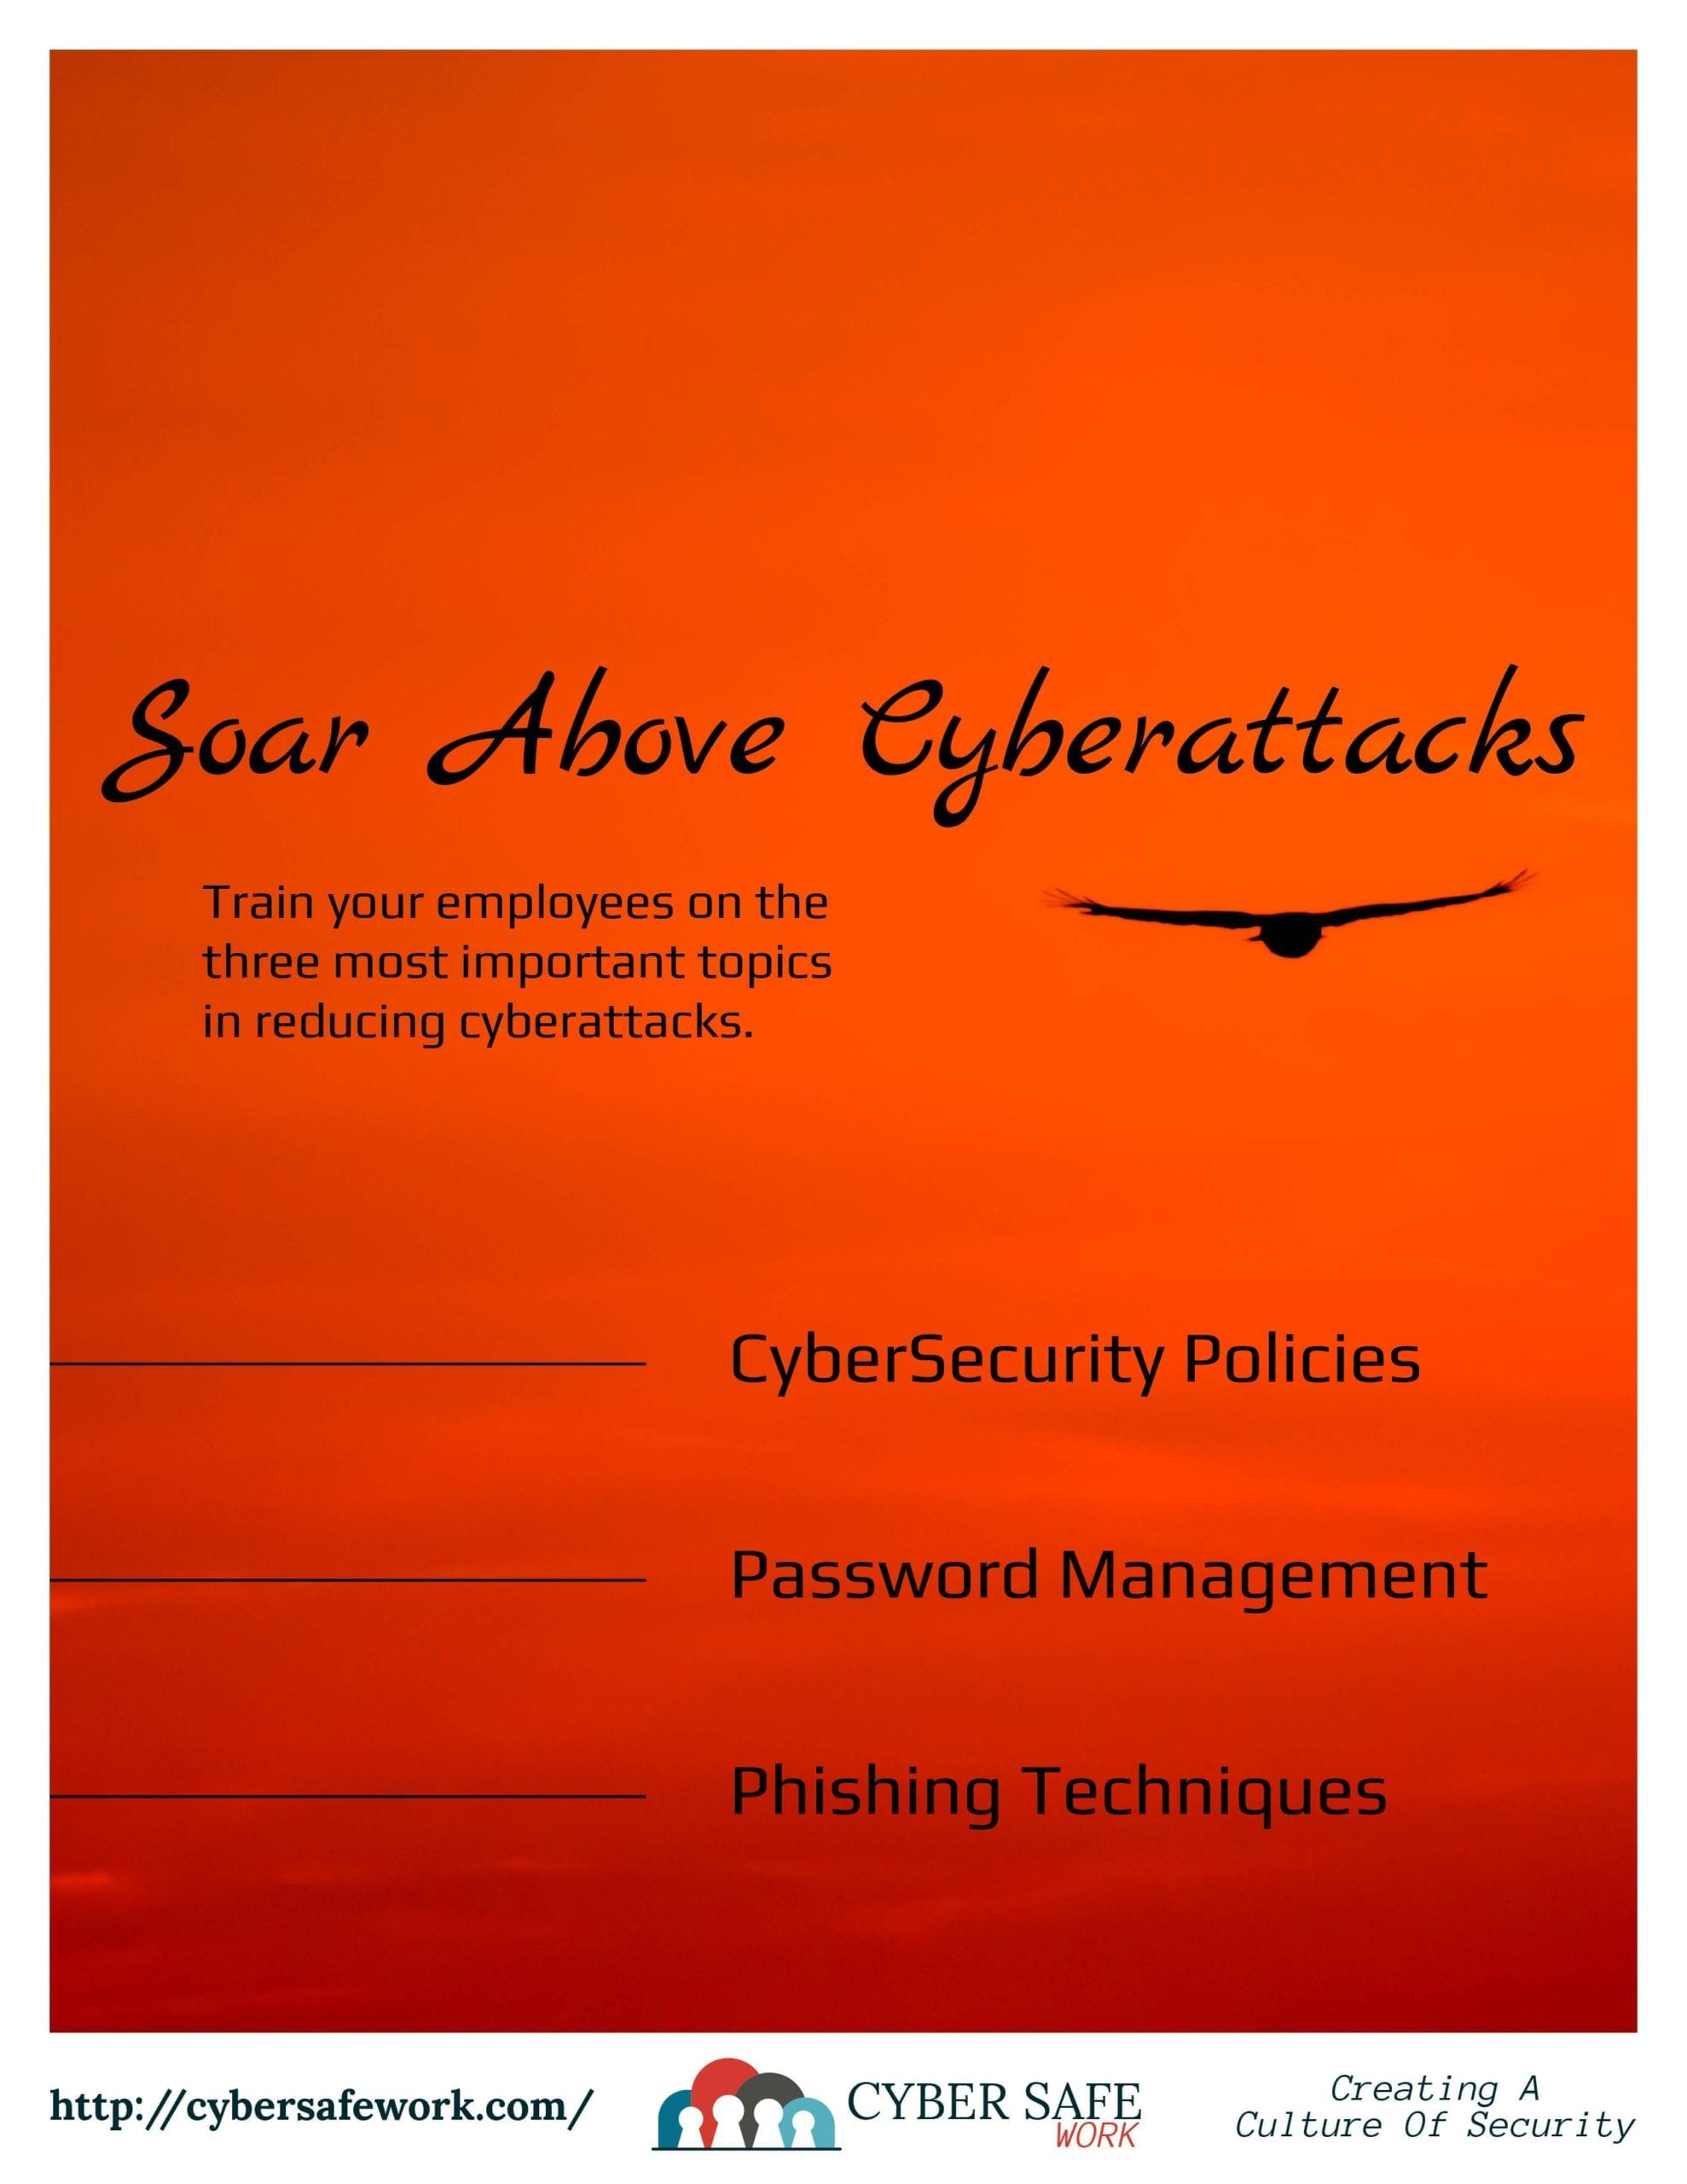 February 2019 CyberSafe Work Poster